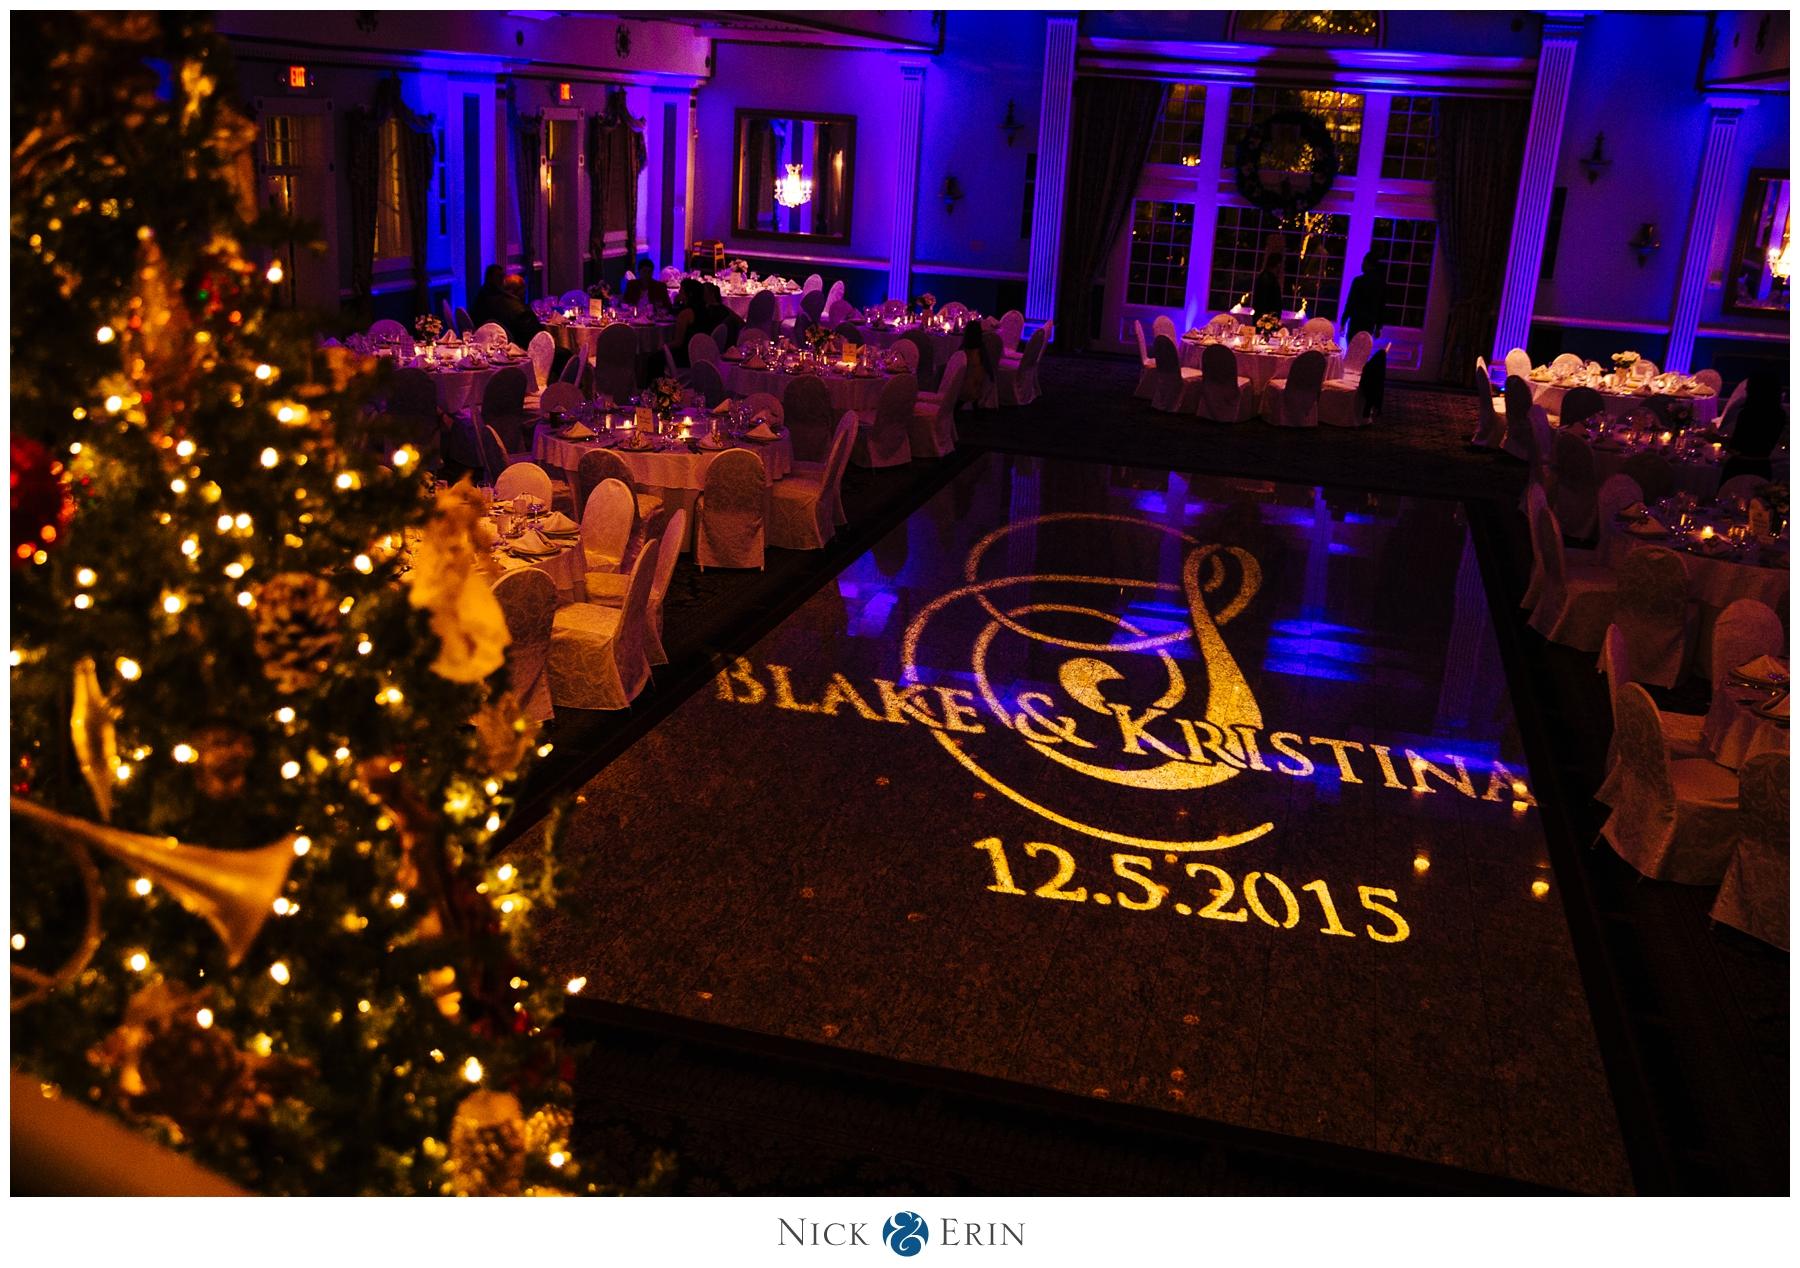 Donner_Photography_Mendenhall Inn Wedding_Blake & Kristina_0038